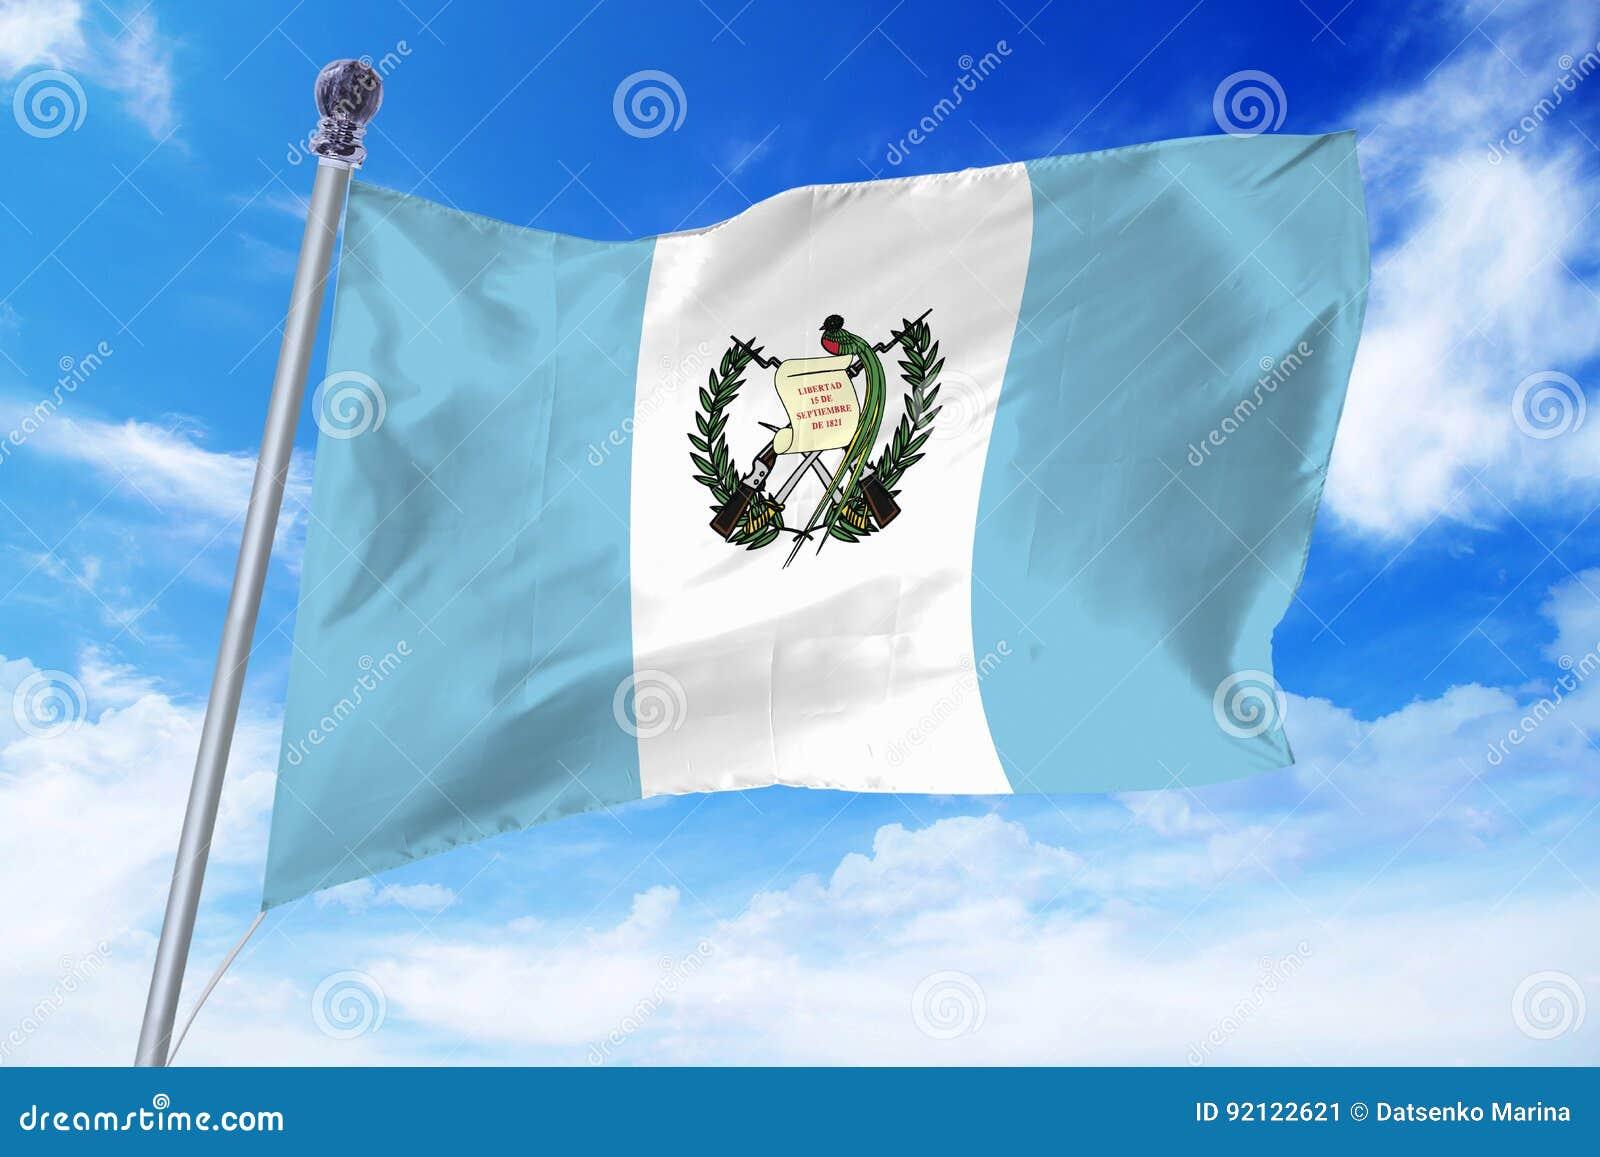 Bandera De Guatemala Stock Images - Download 331 Photos